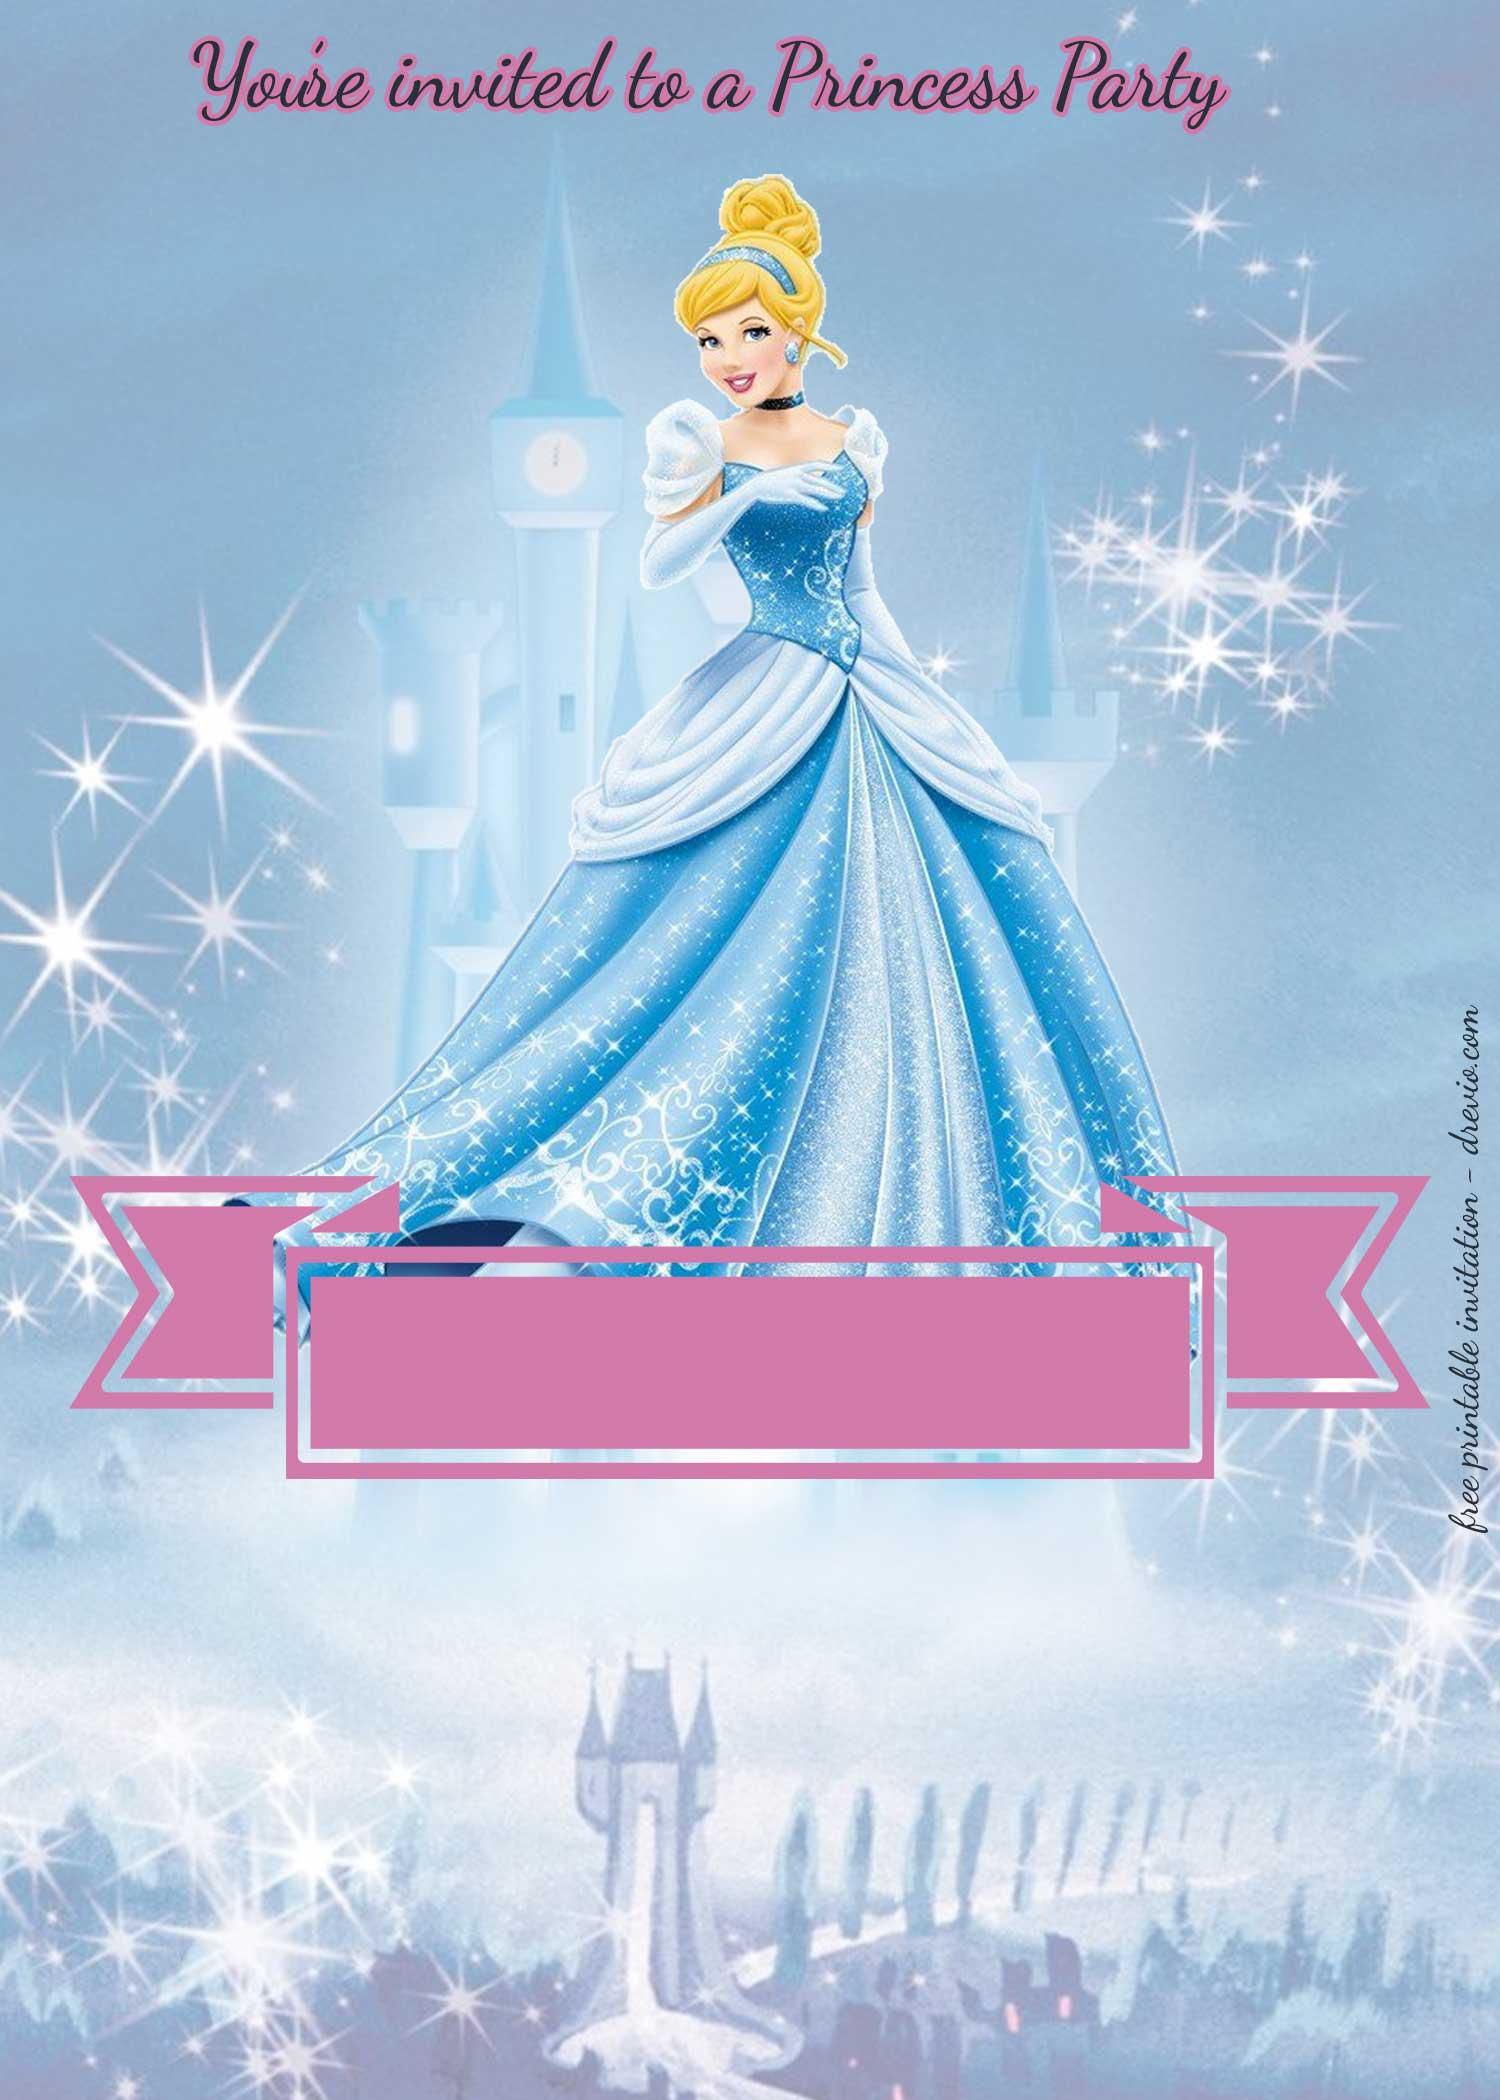 free princess party birthday invitation